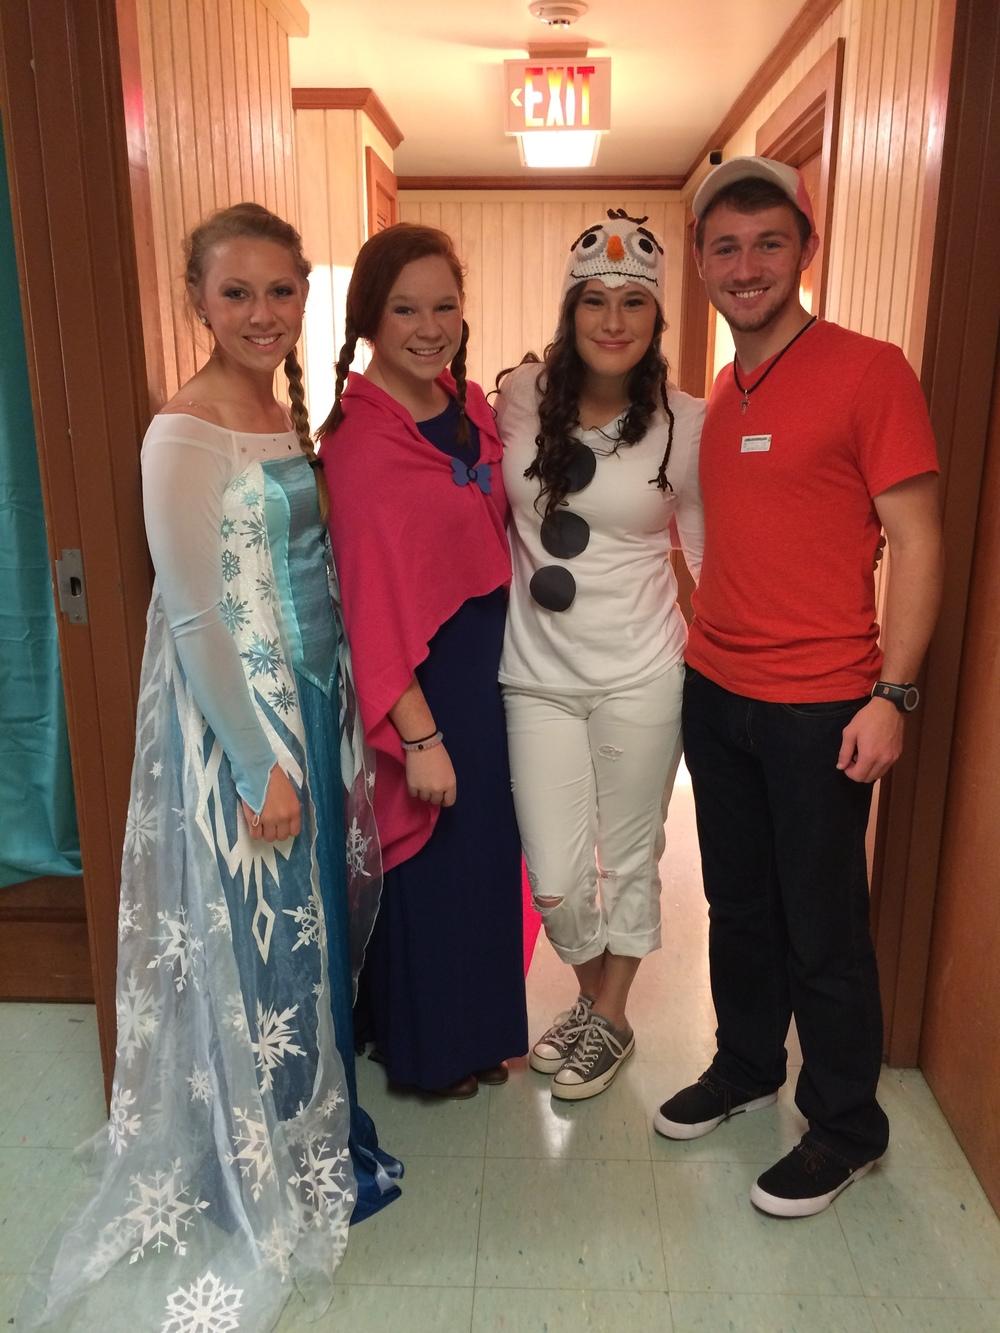 Landon A. Toney, Emily Brown, Carson Parnell and Jessi Varner enjoyed open dorm night together.